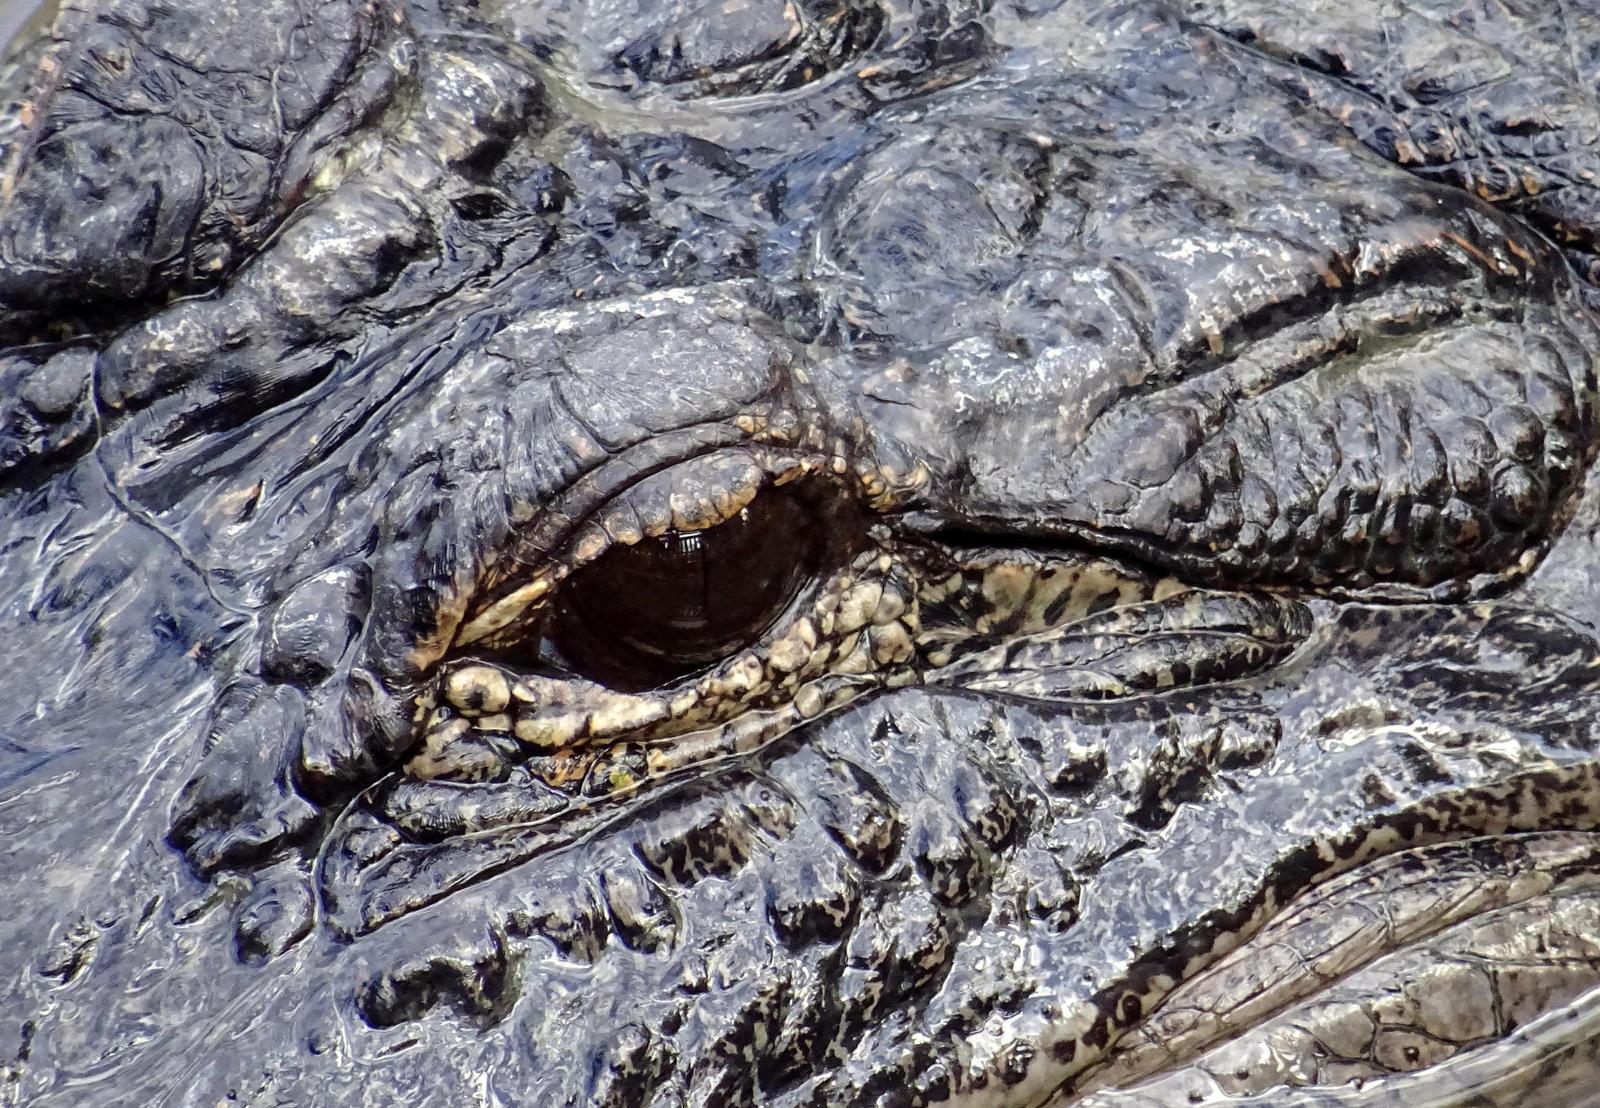 gator eye by Mittelfranke